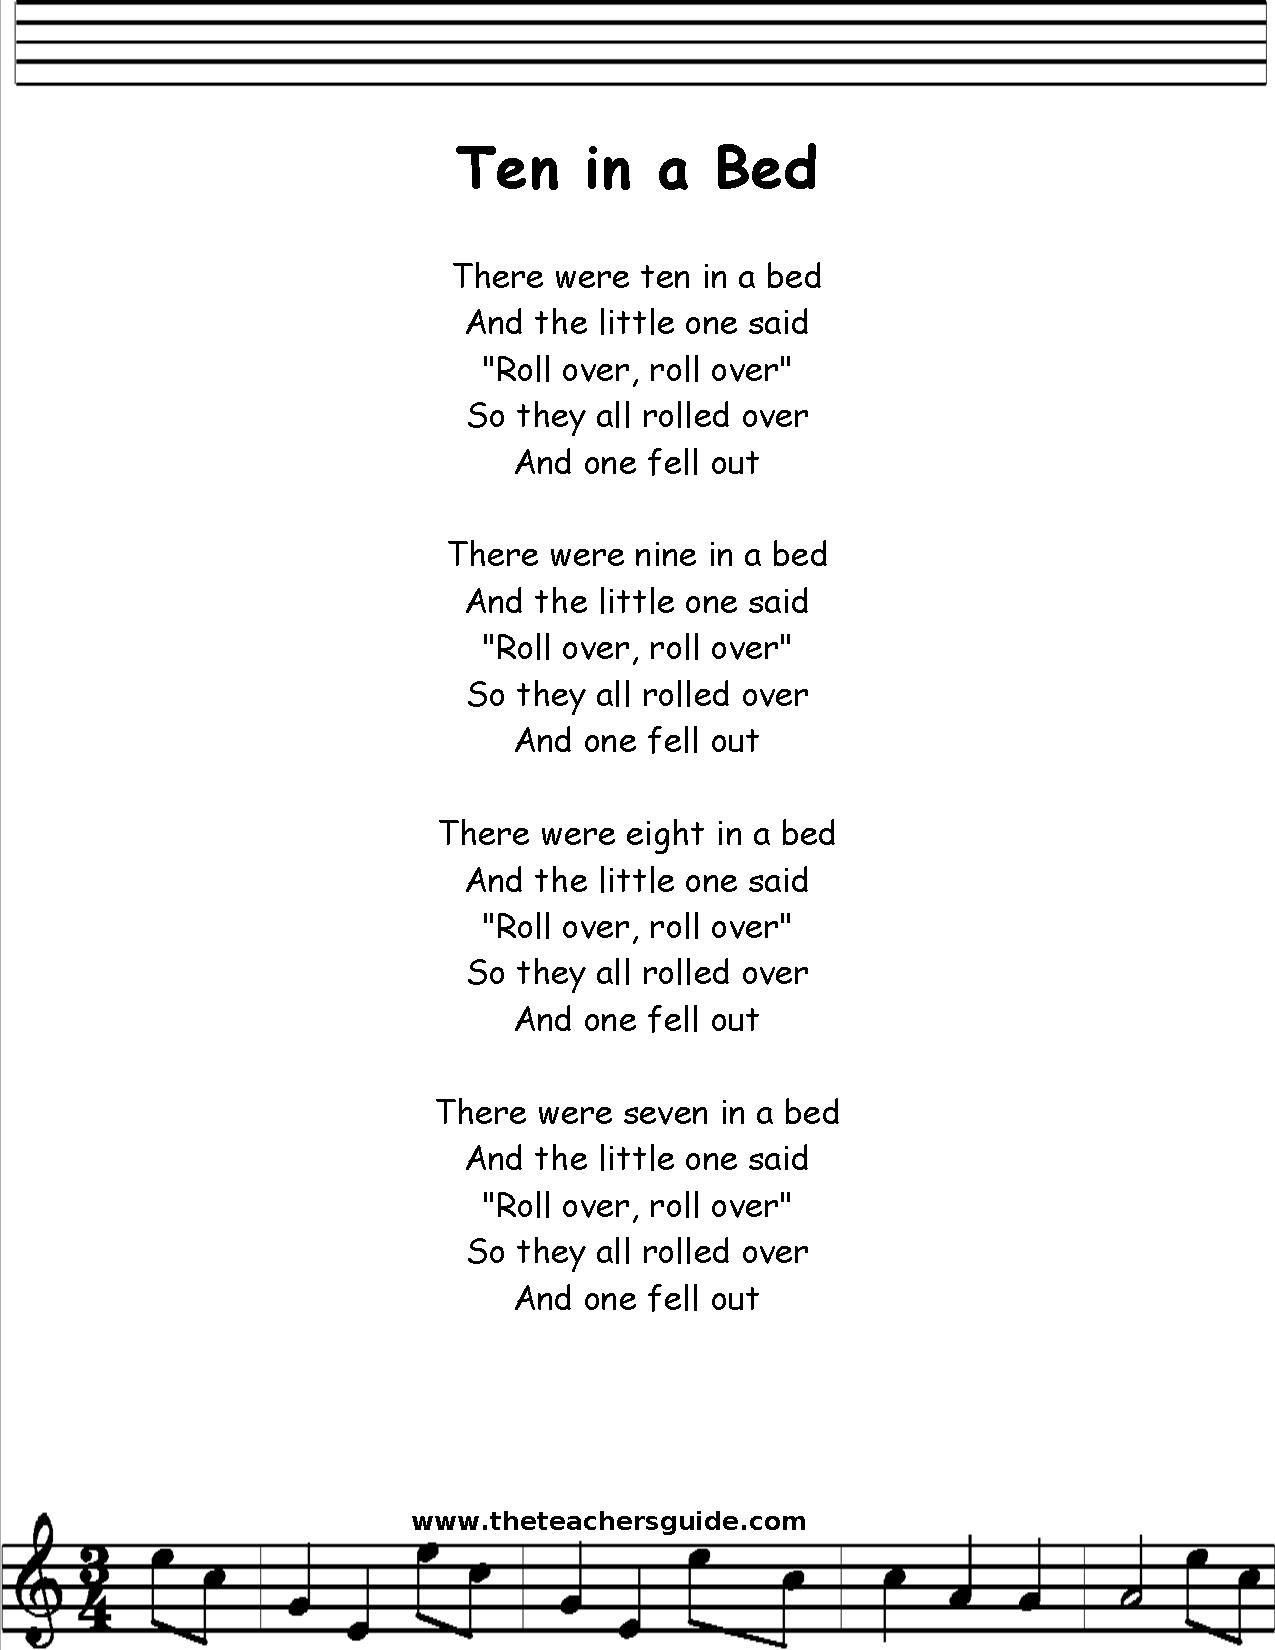 Ten In A Bed Lyrics Printout